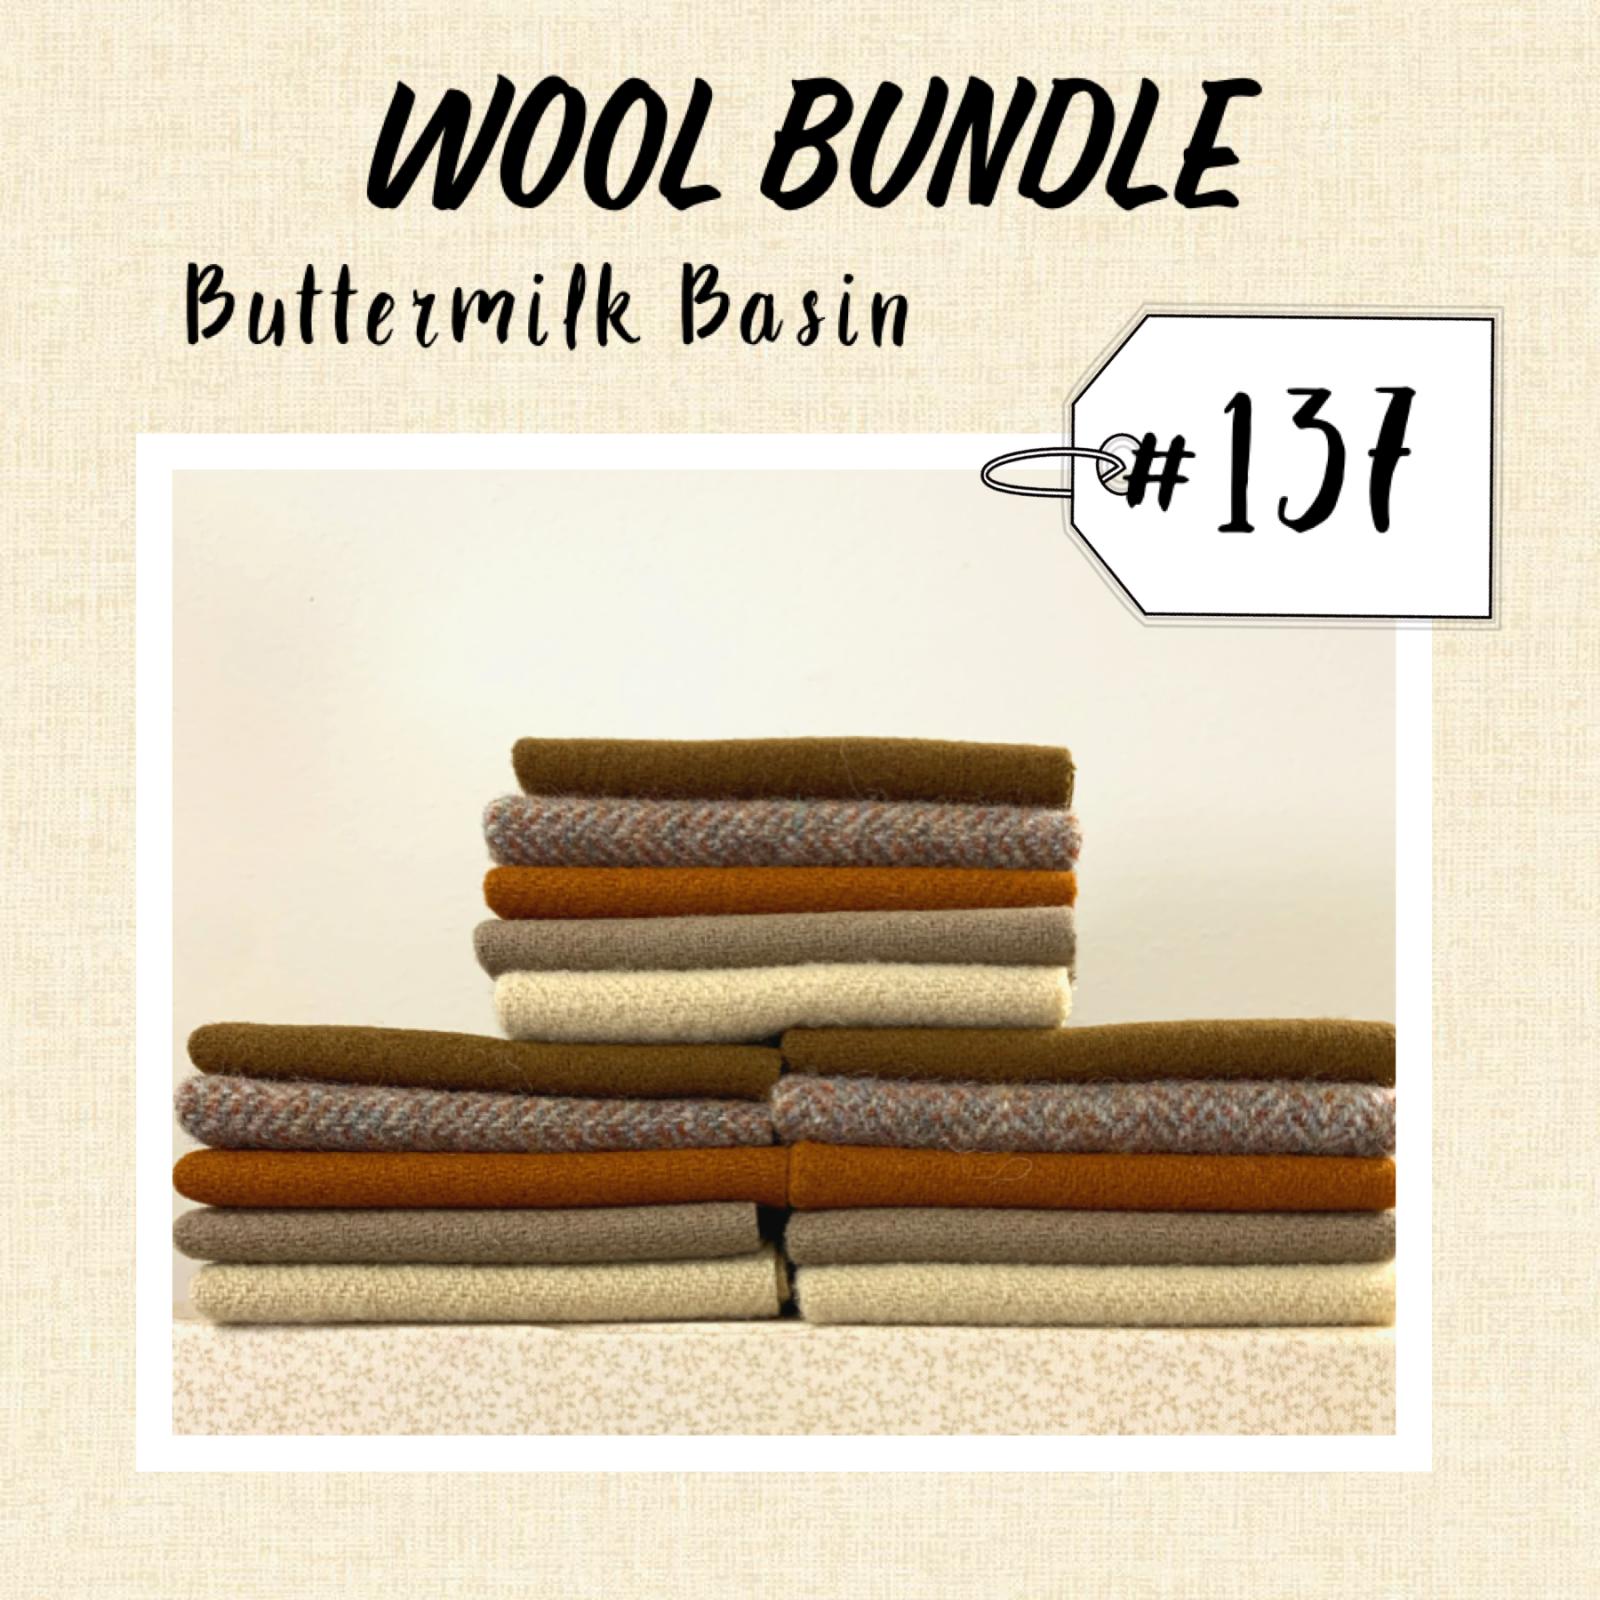 Wool Bundle #137B